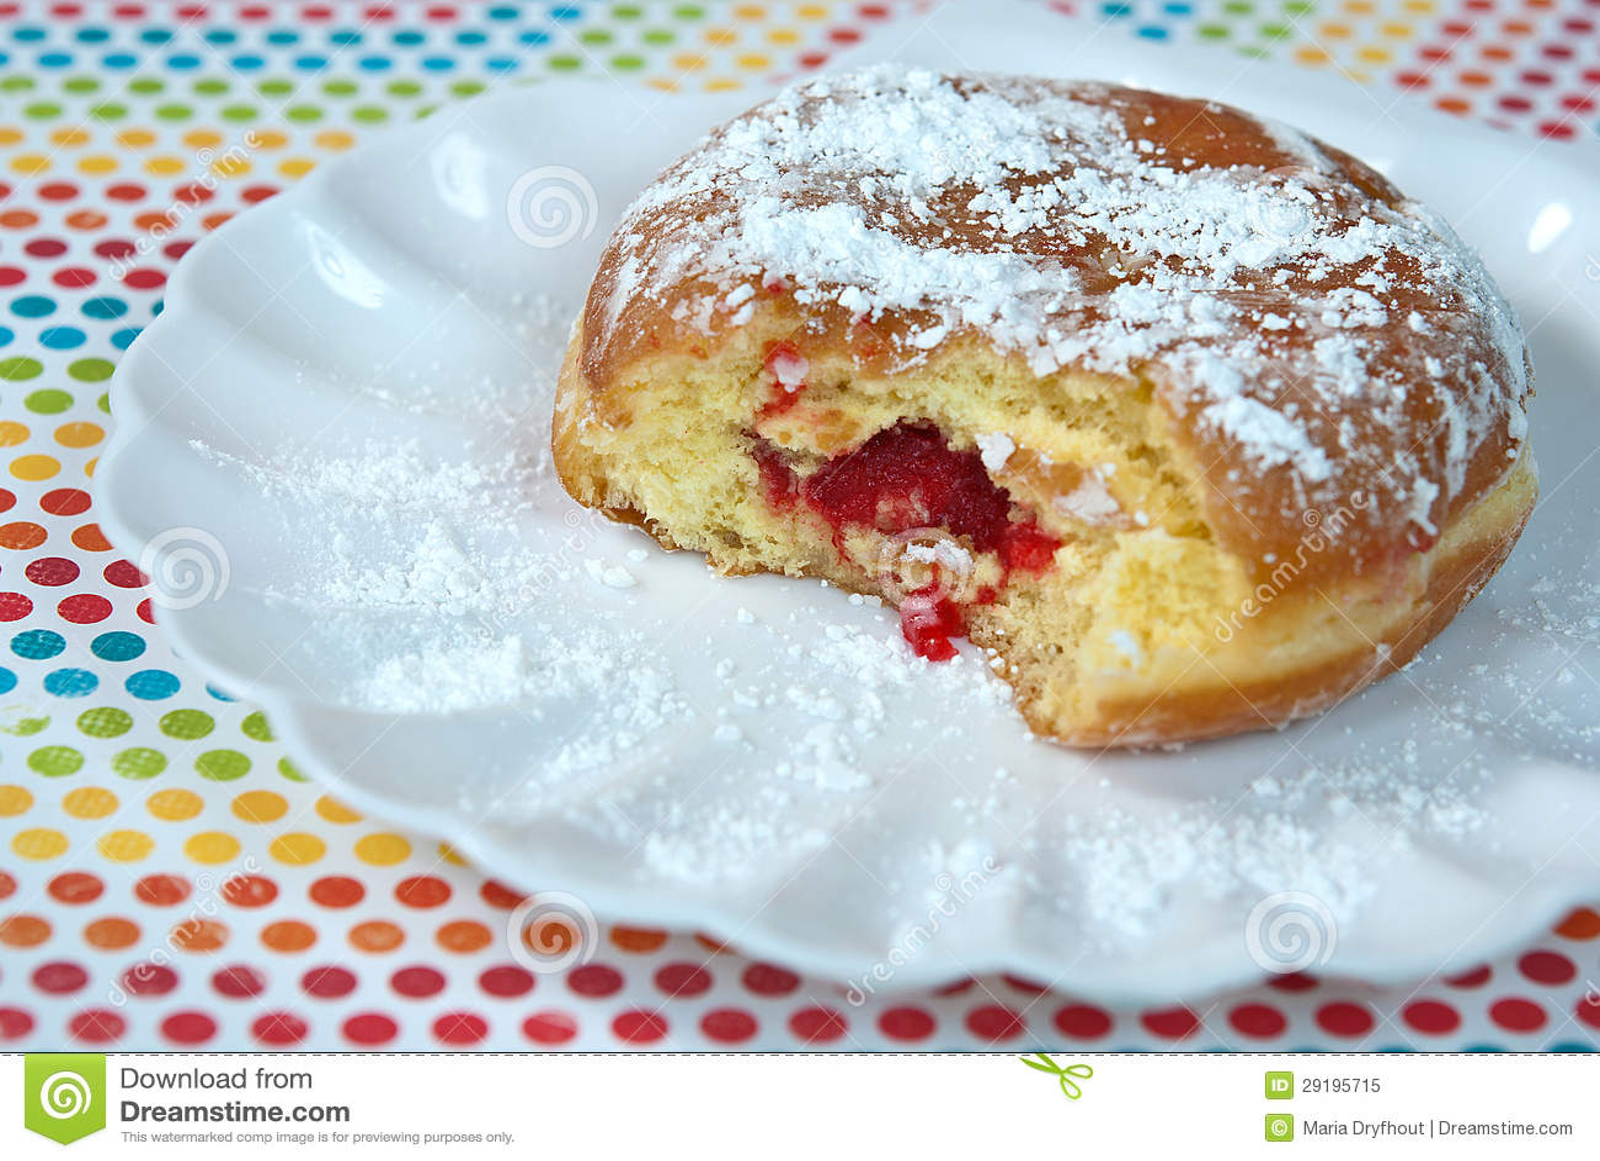 Pâtisserie polonaise